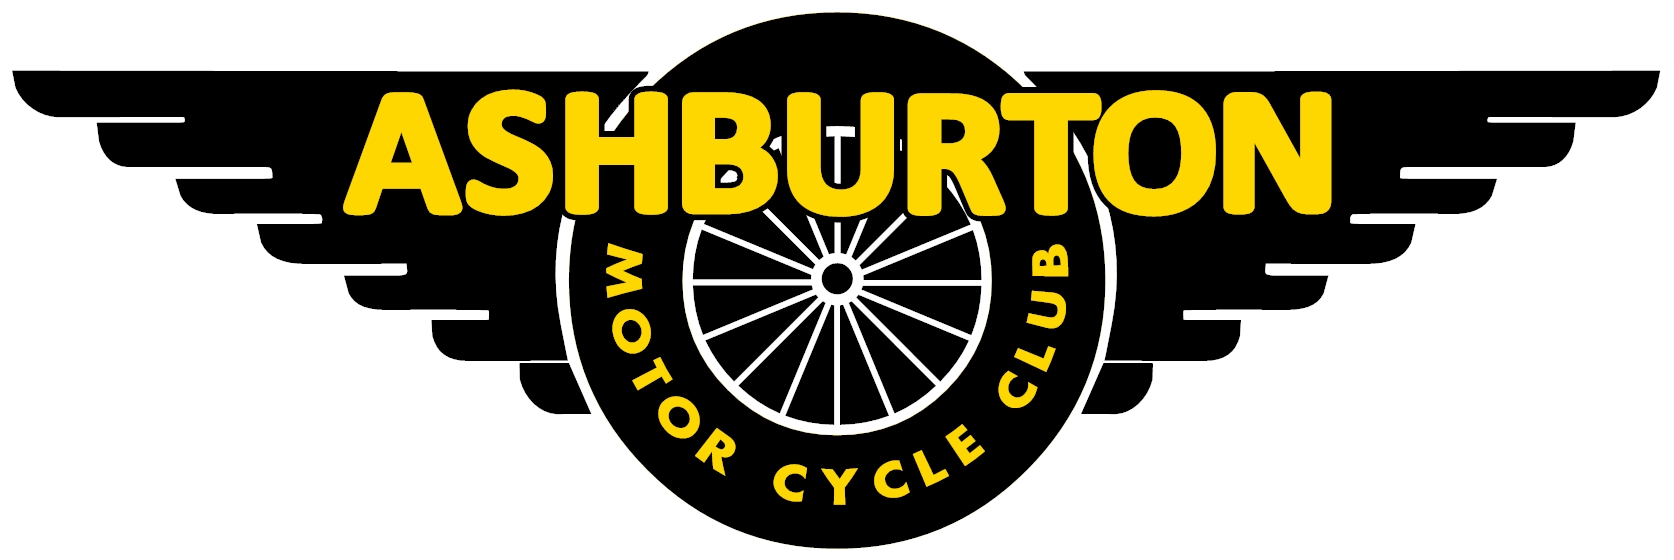 Ashburton Motorcycle Club